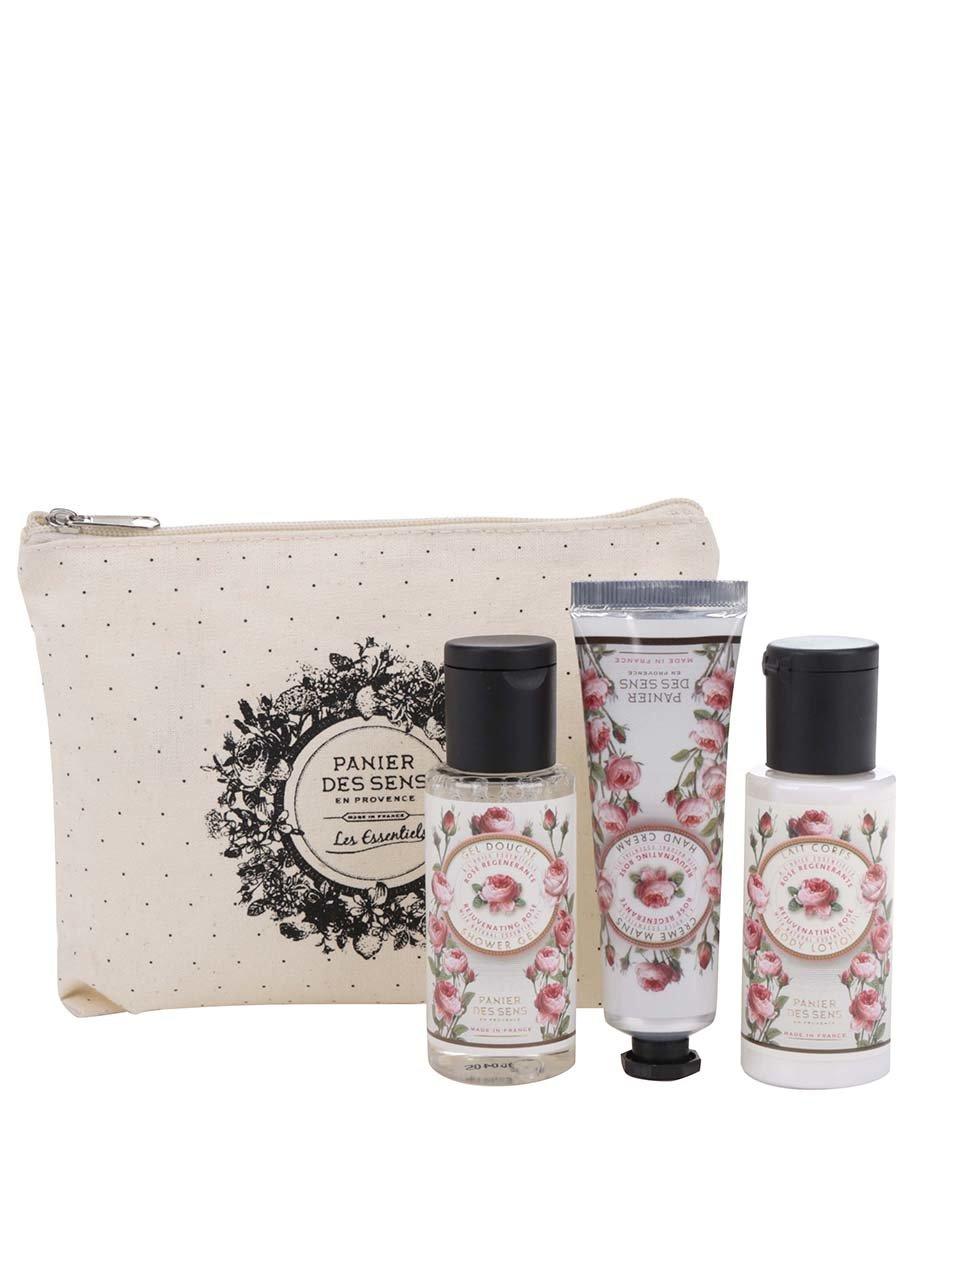 Cestovní kosmetická sada Panier des Sens Růže